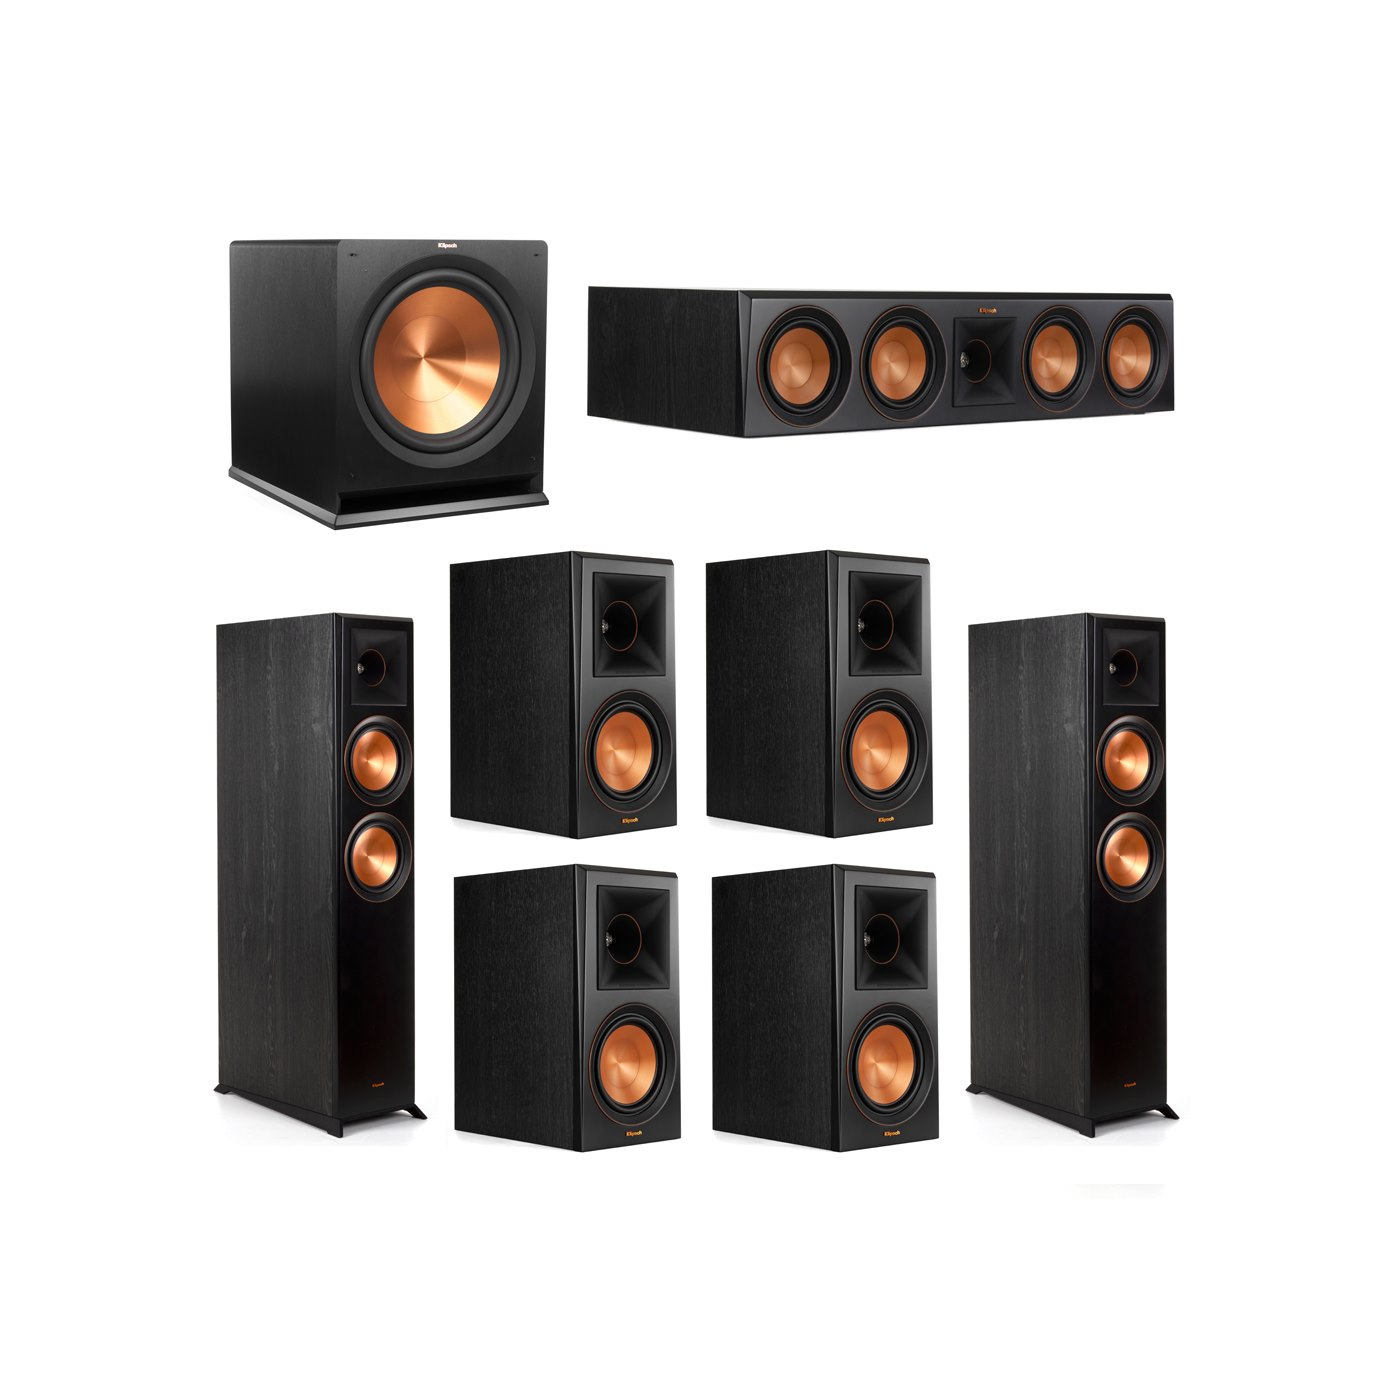 Klipsch 7.1 System with 2 RP-6000F Floorstanding Speakers, 1 Klipsch RP-504C Center Speaker, 4 Klipsch RP-600M Surround Speakers, 1 Klipsch R-115SW Subwoofer